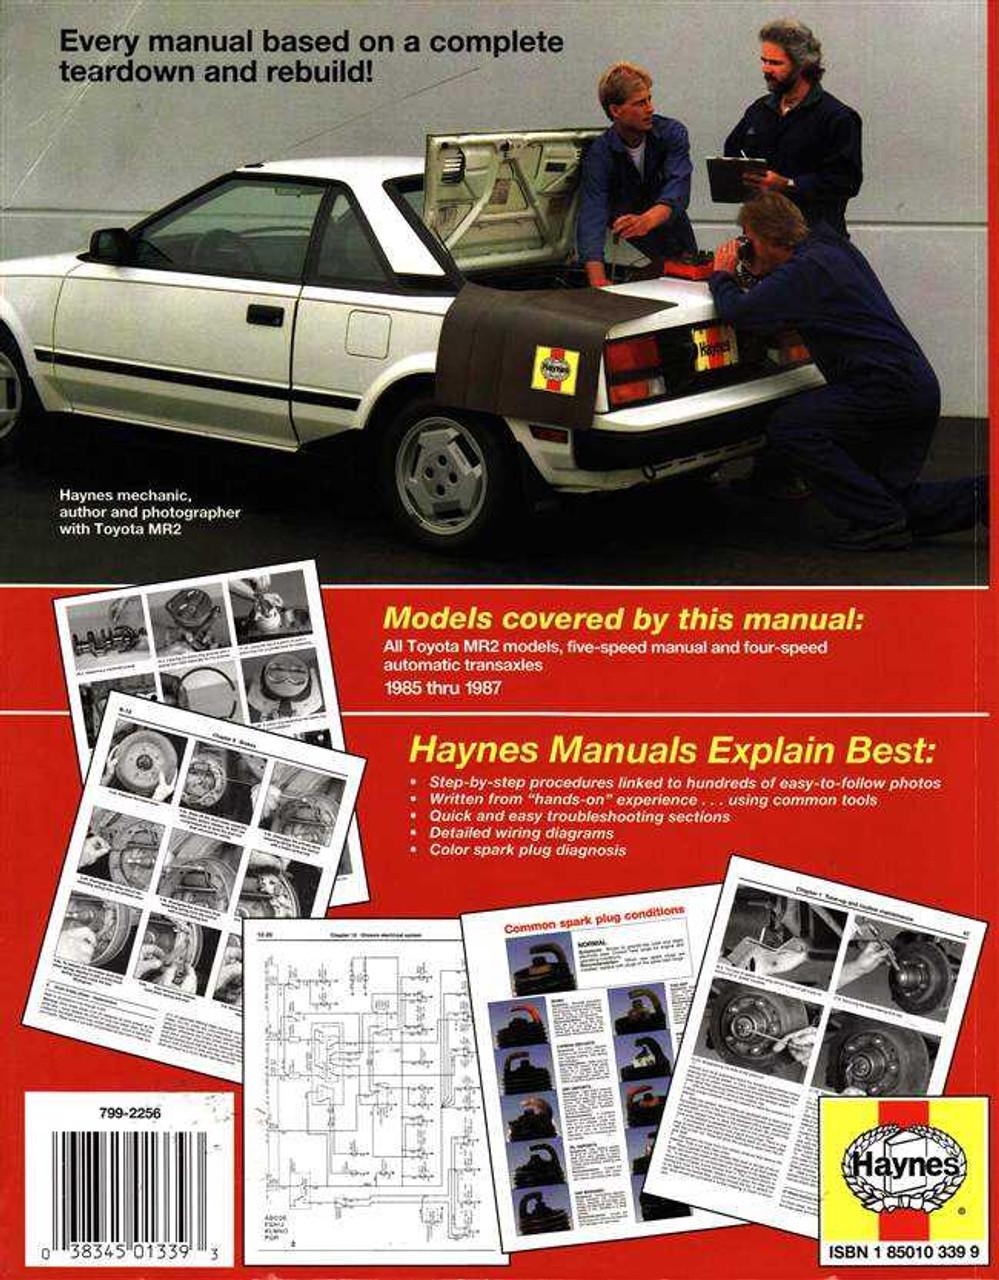 87 toyota mr2 workshop manual sample user manual u2022 rh huelladakarbolivia com 1991 Toyota MR2 1994 Toyota MR2